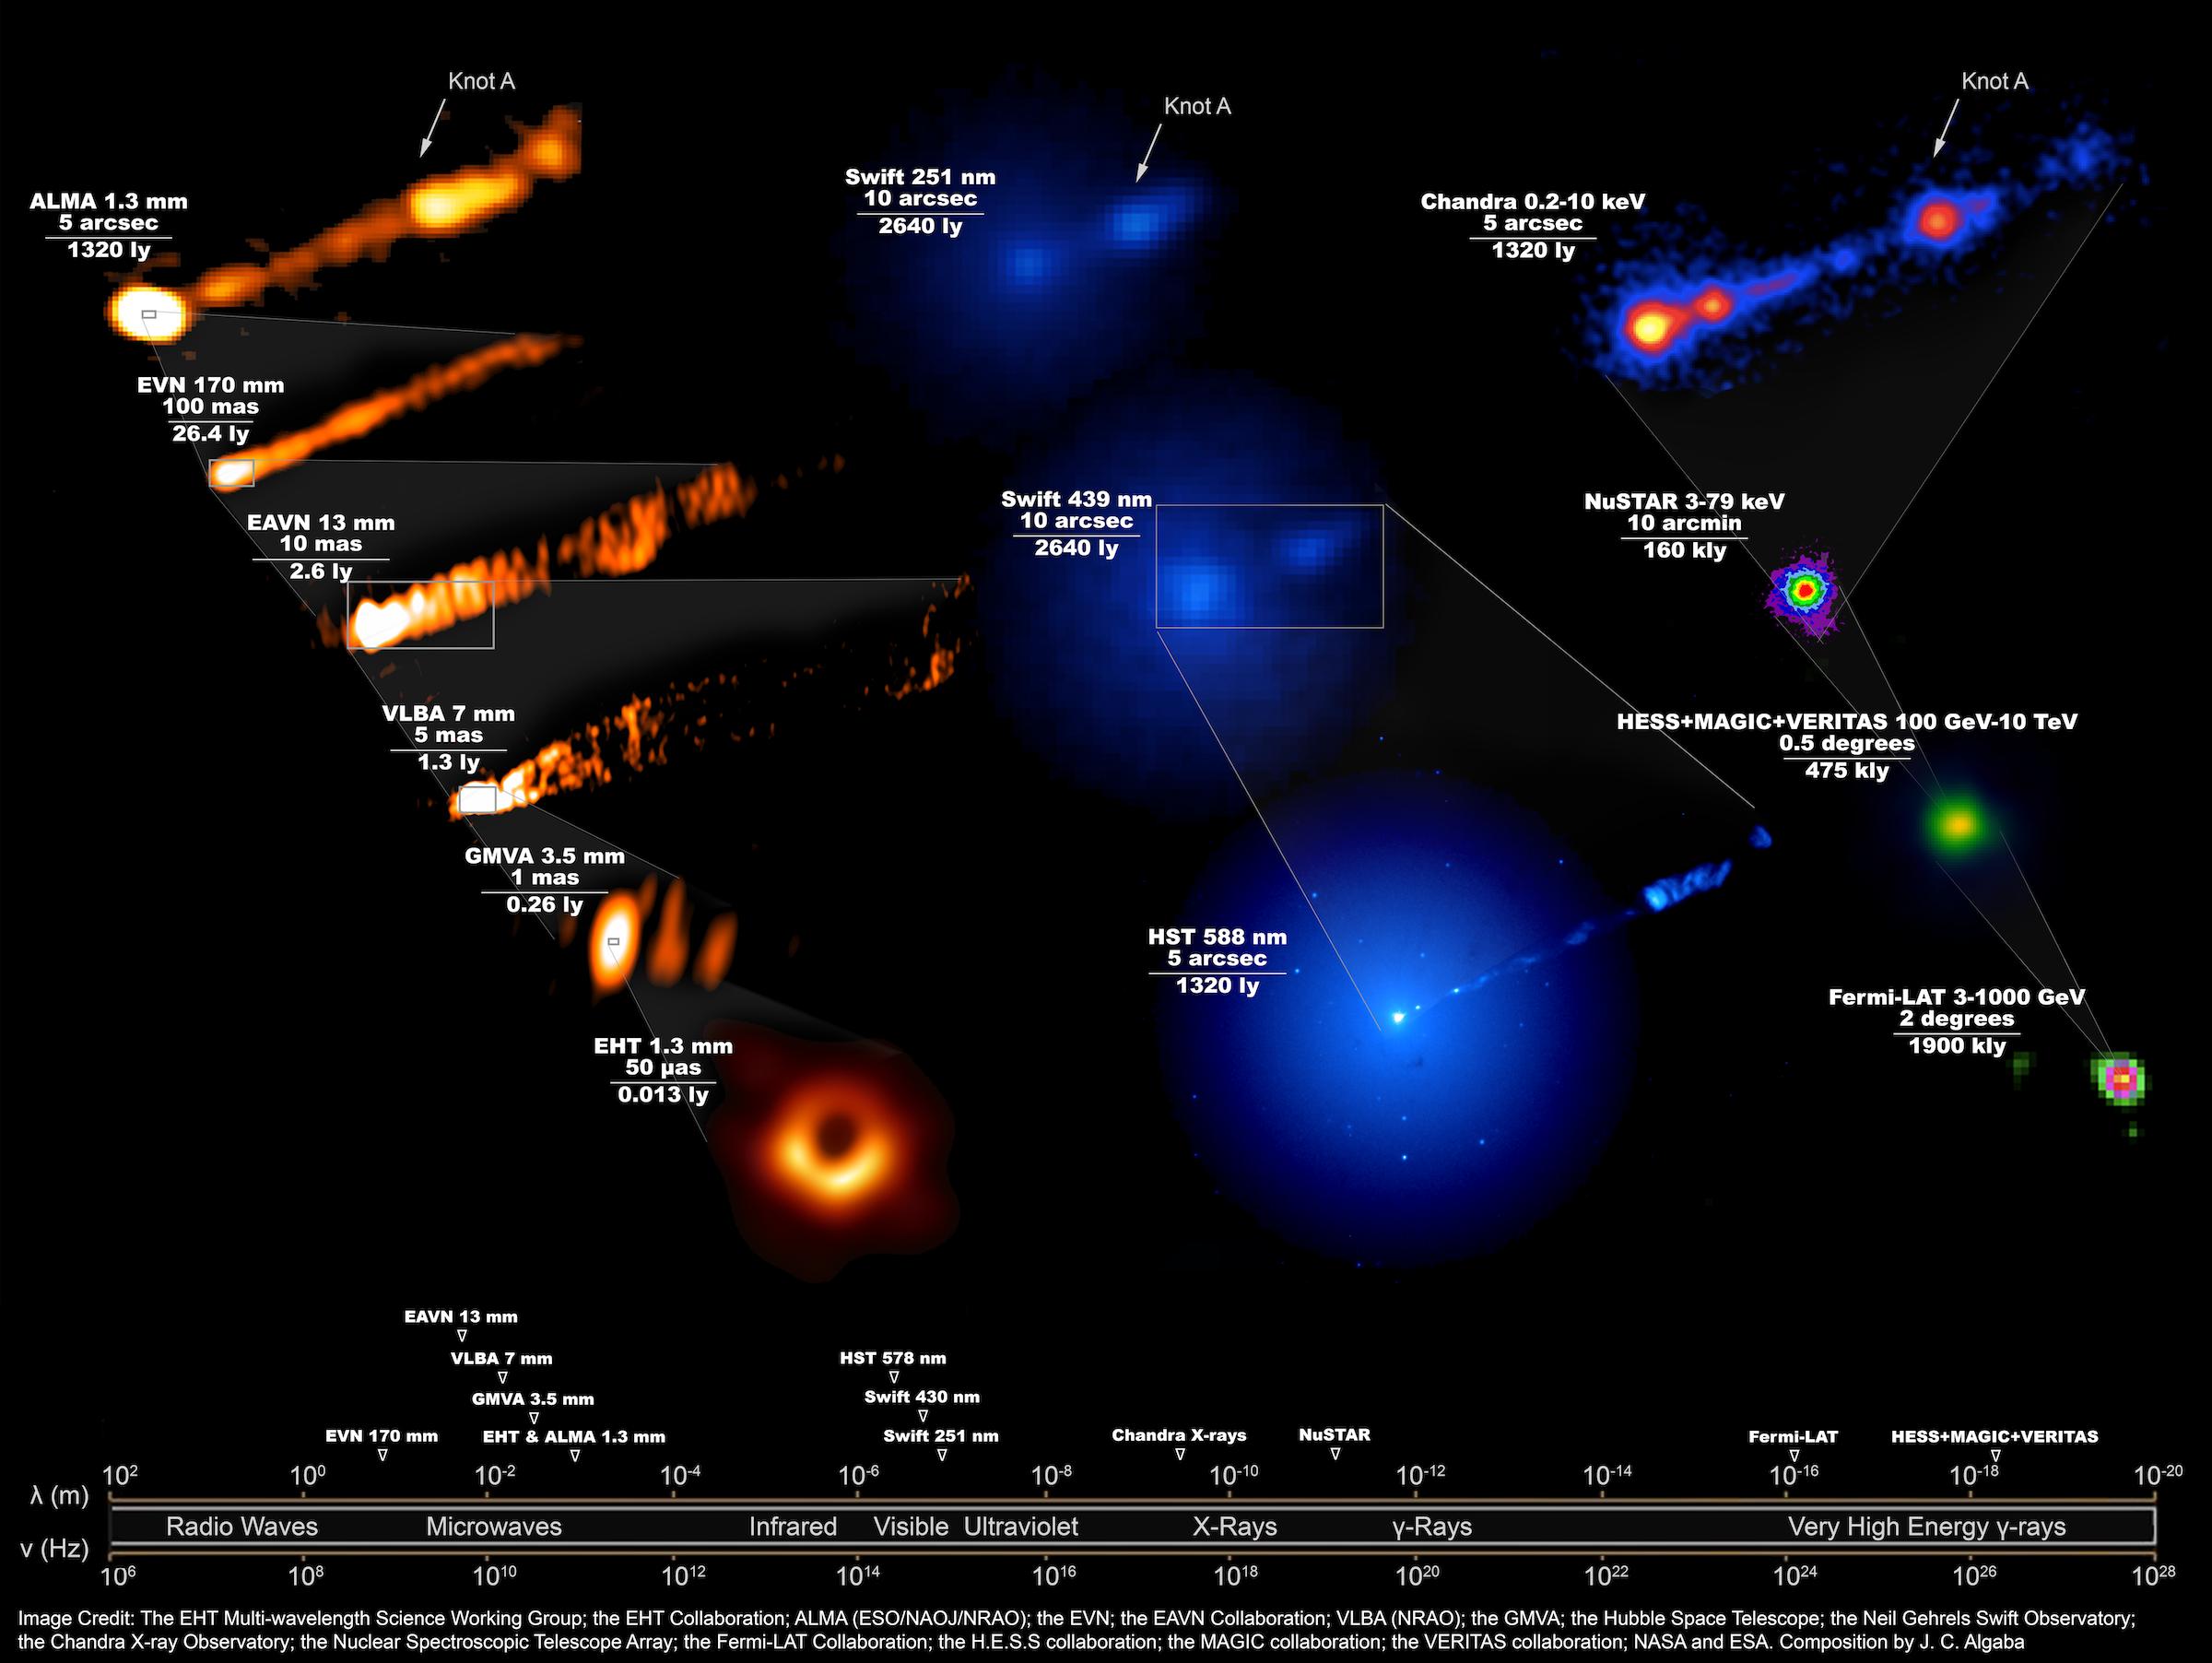 EHT M87 multi-wavelength image